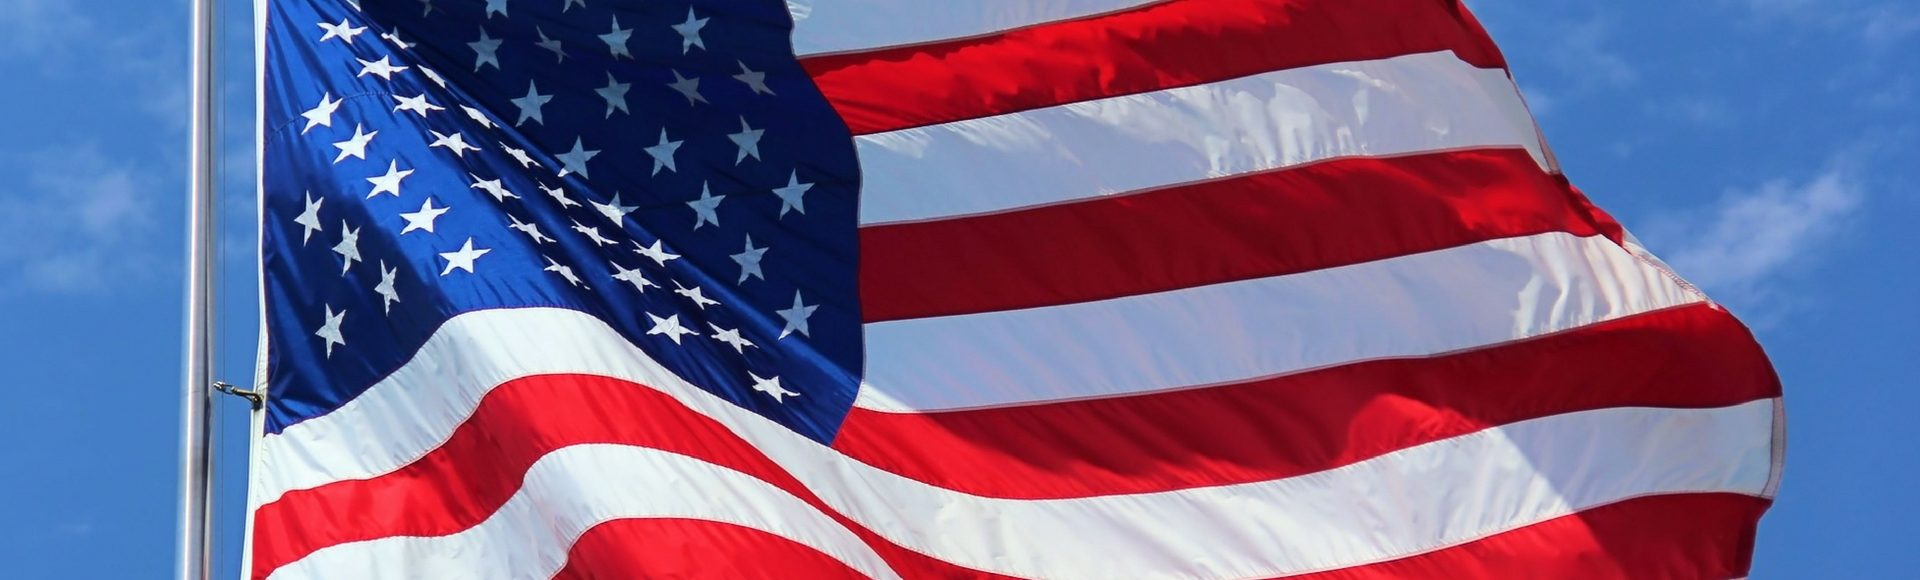 Celebrate Our Veterans